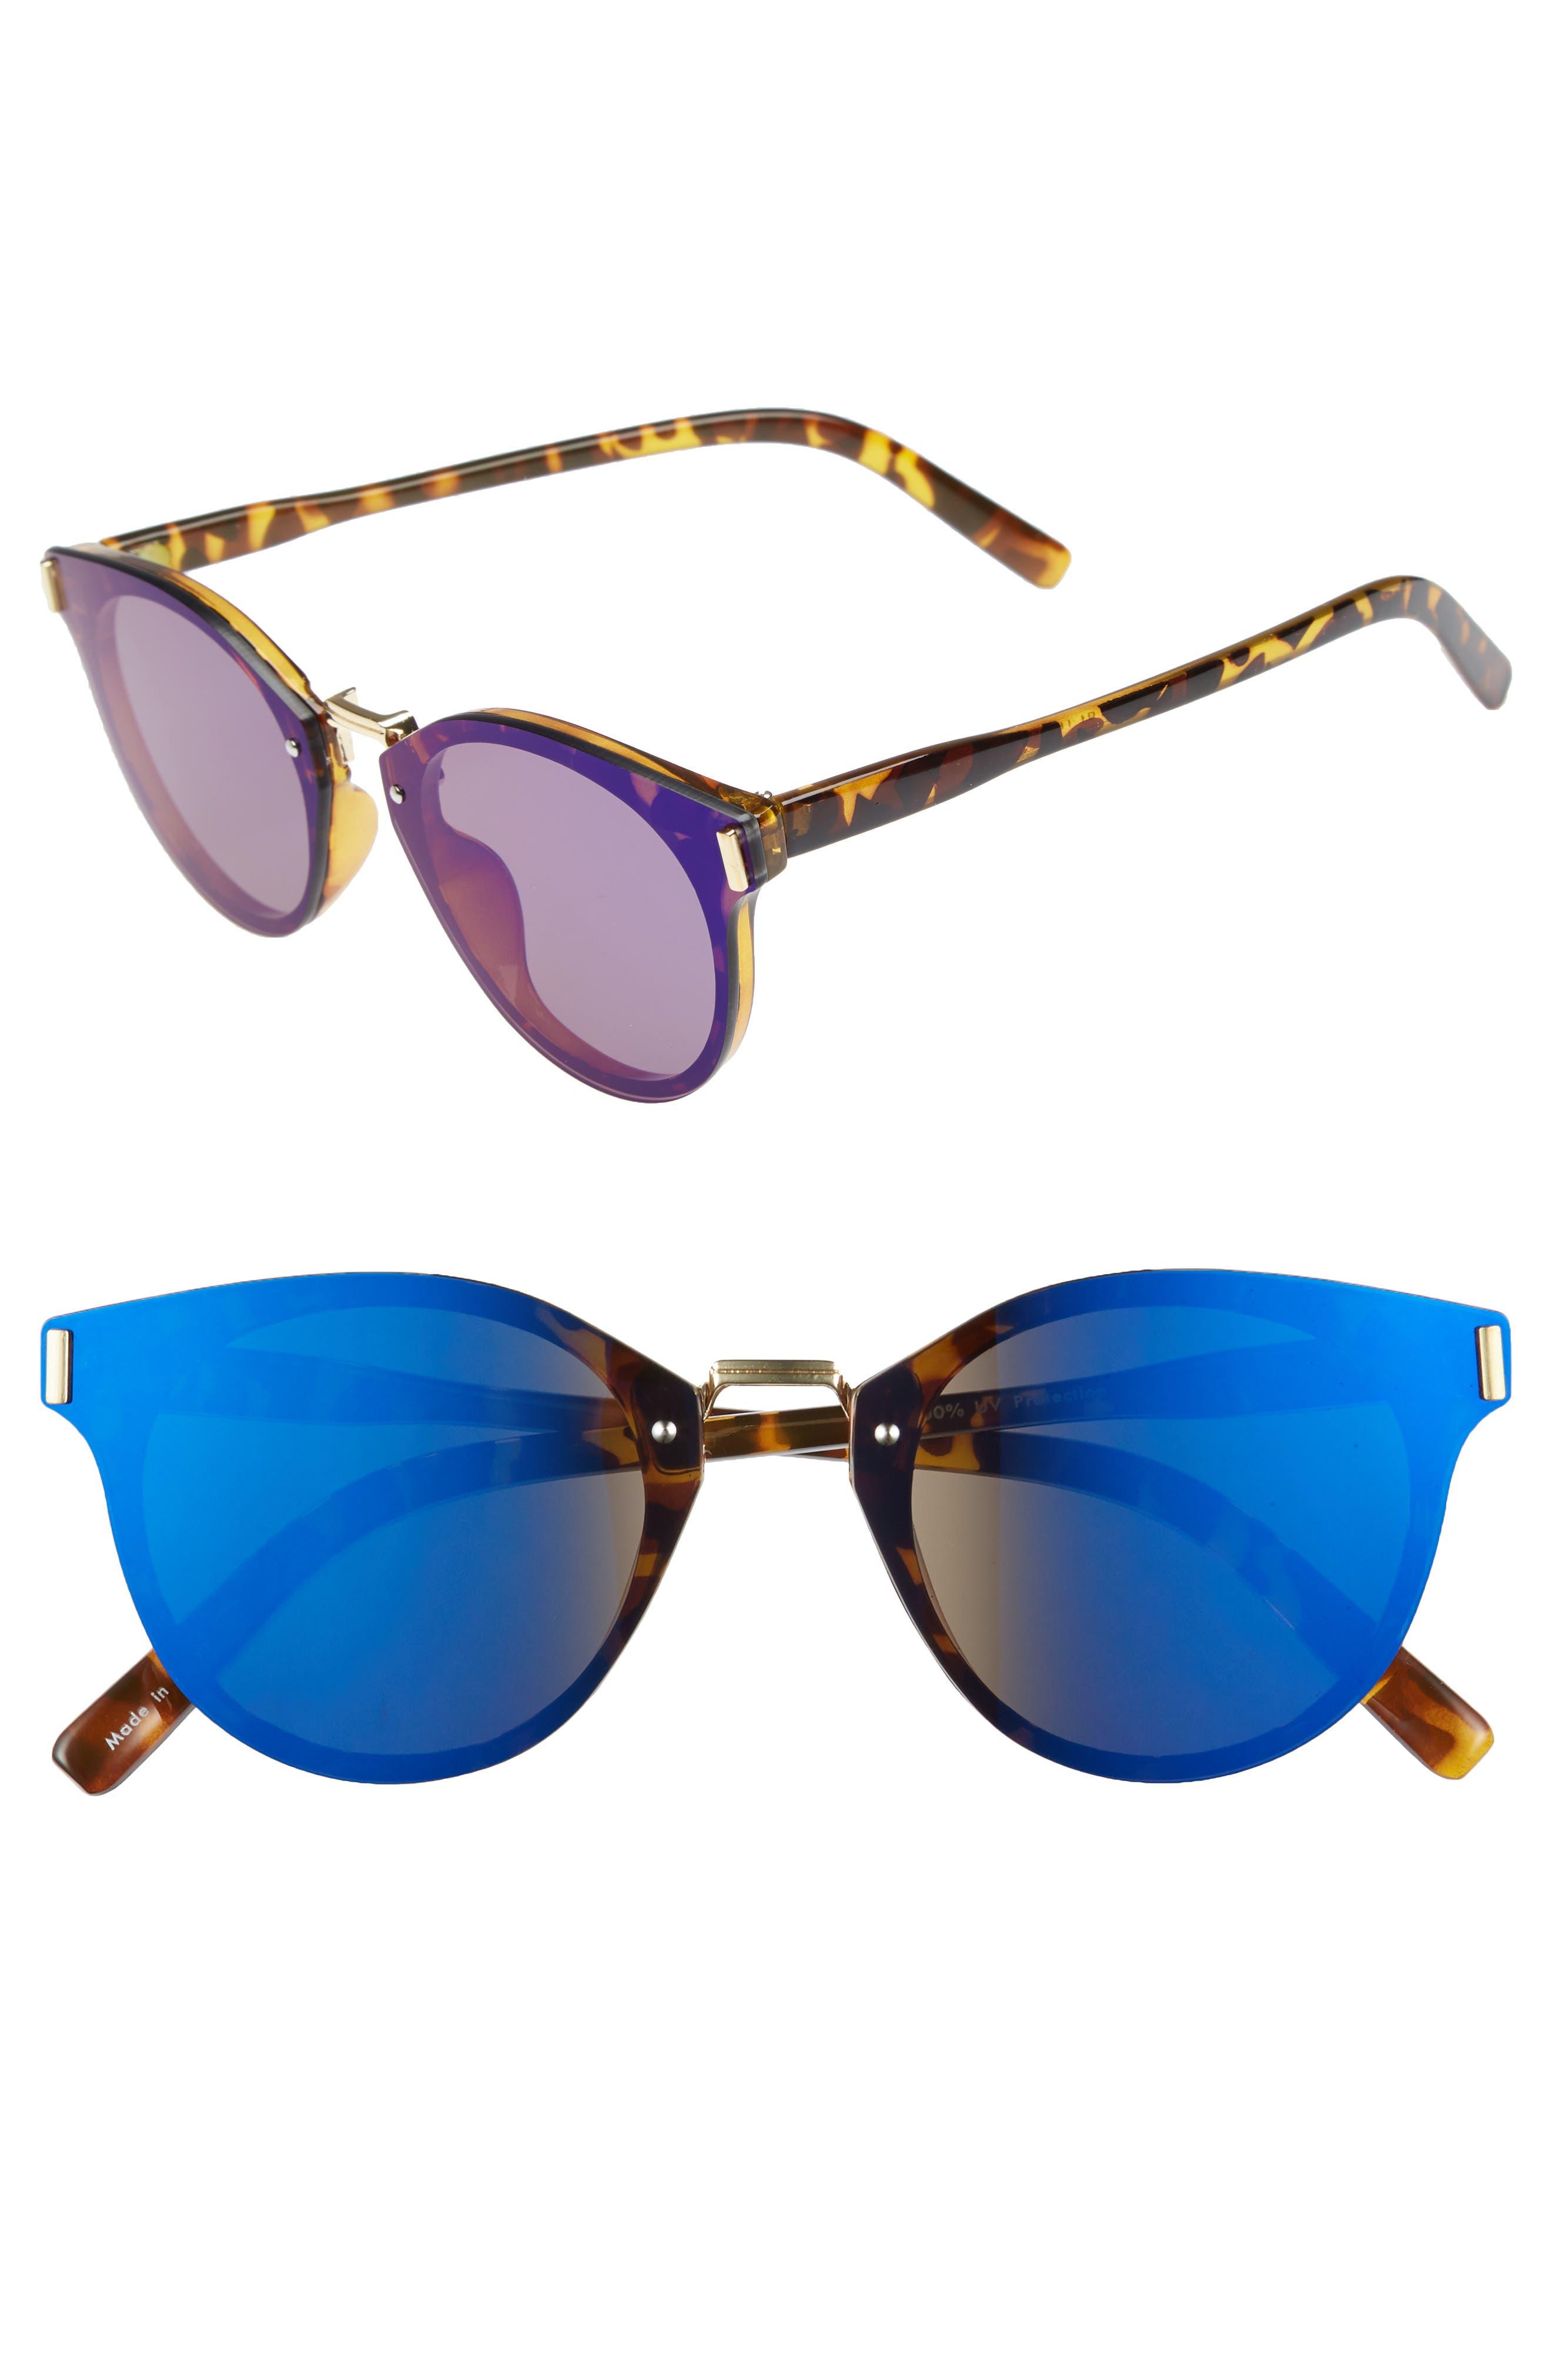 Flat Cat Eye Sunglasses,                         Main,                         color, 200